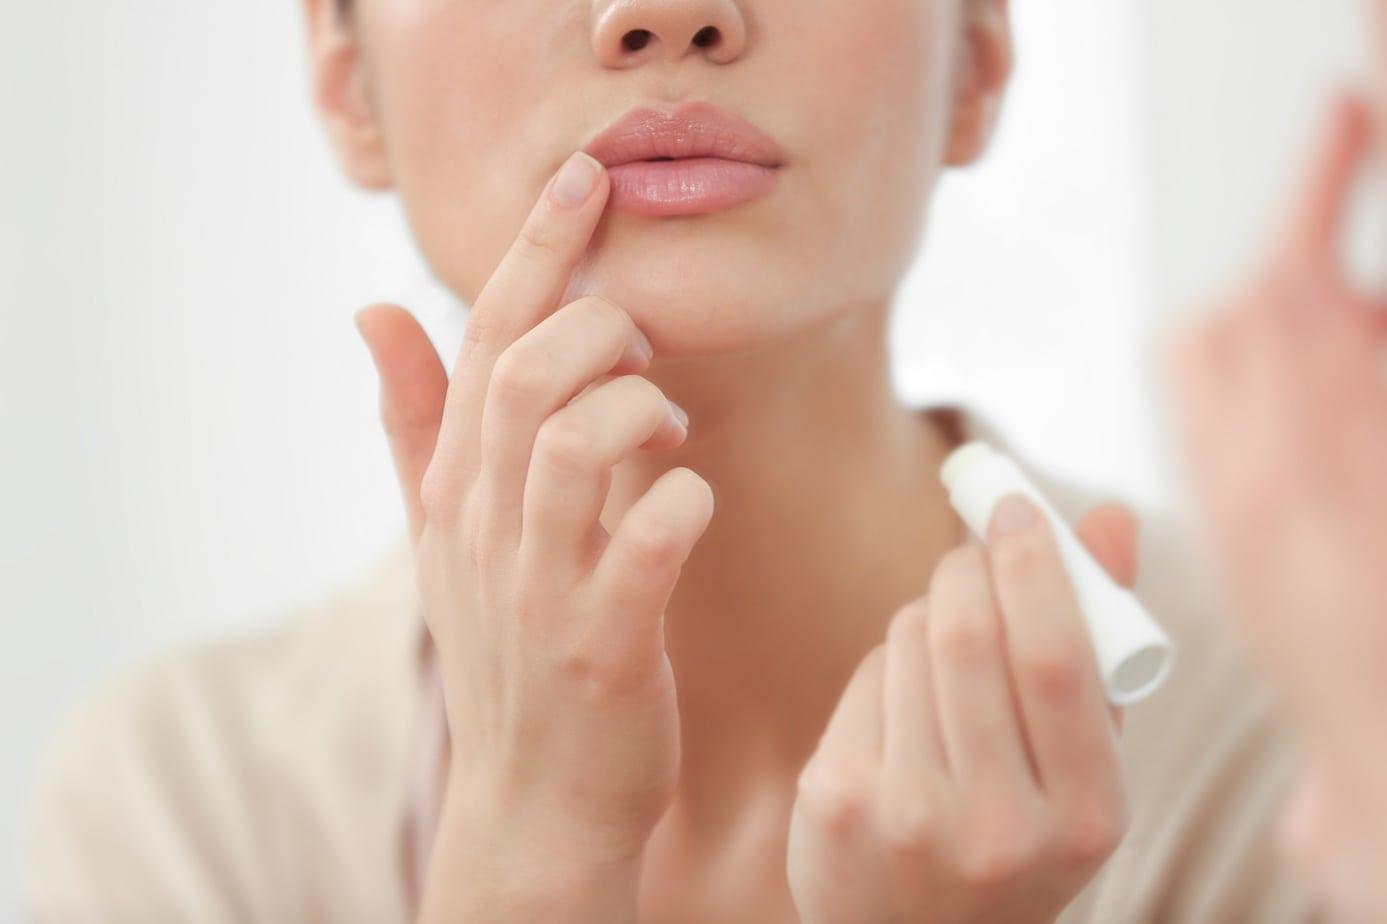 Woman applying hygienic lip balm near mirror